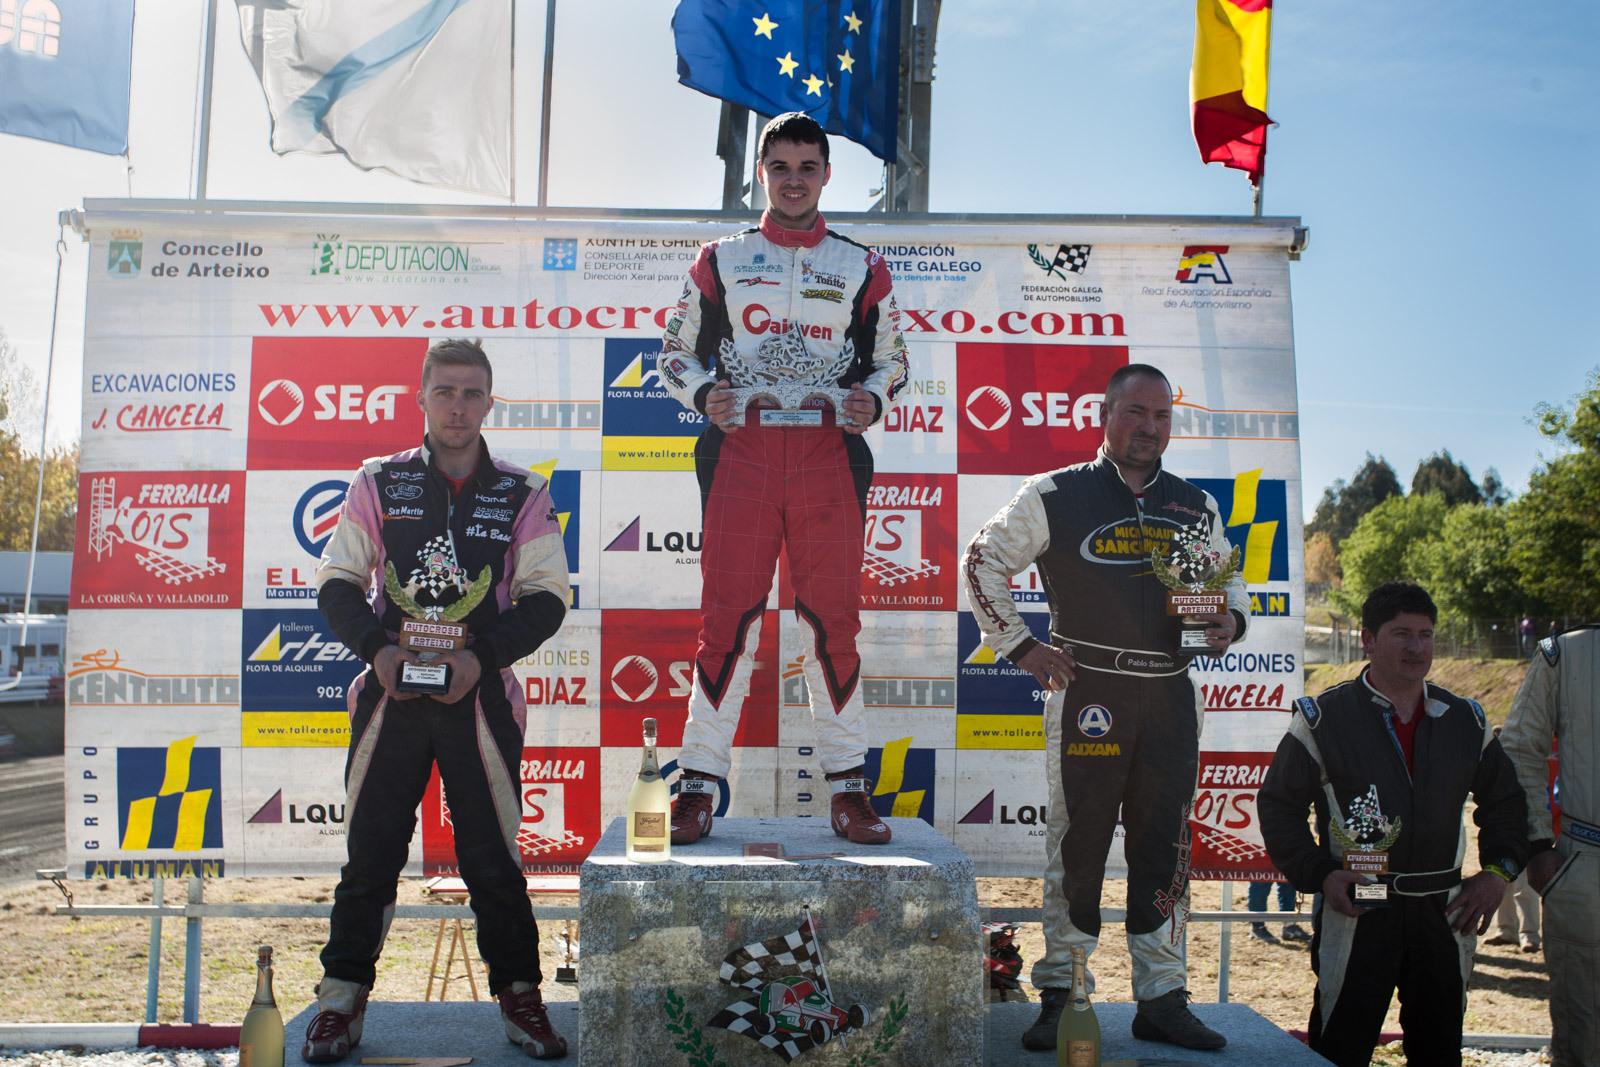 003 Autocross Arteixo FGA Abril 2016 042